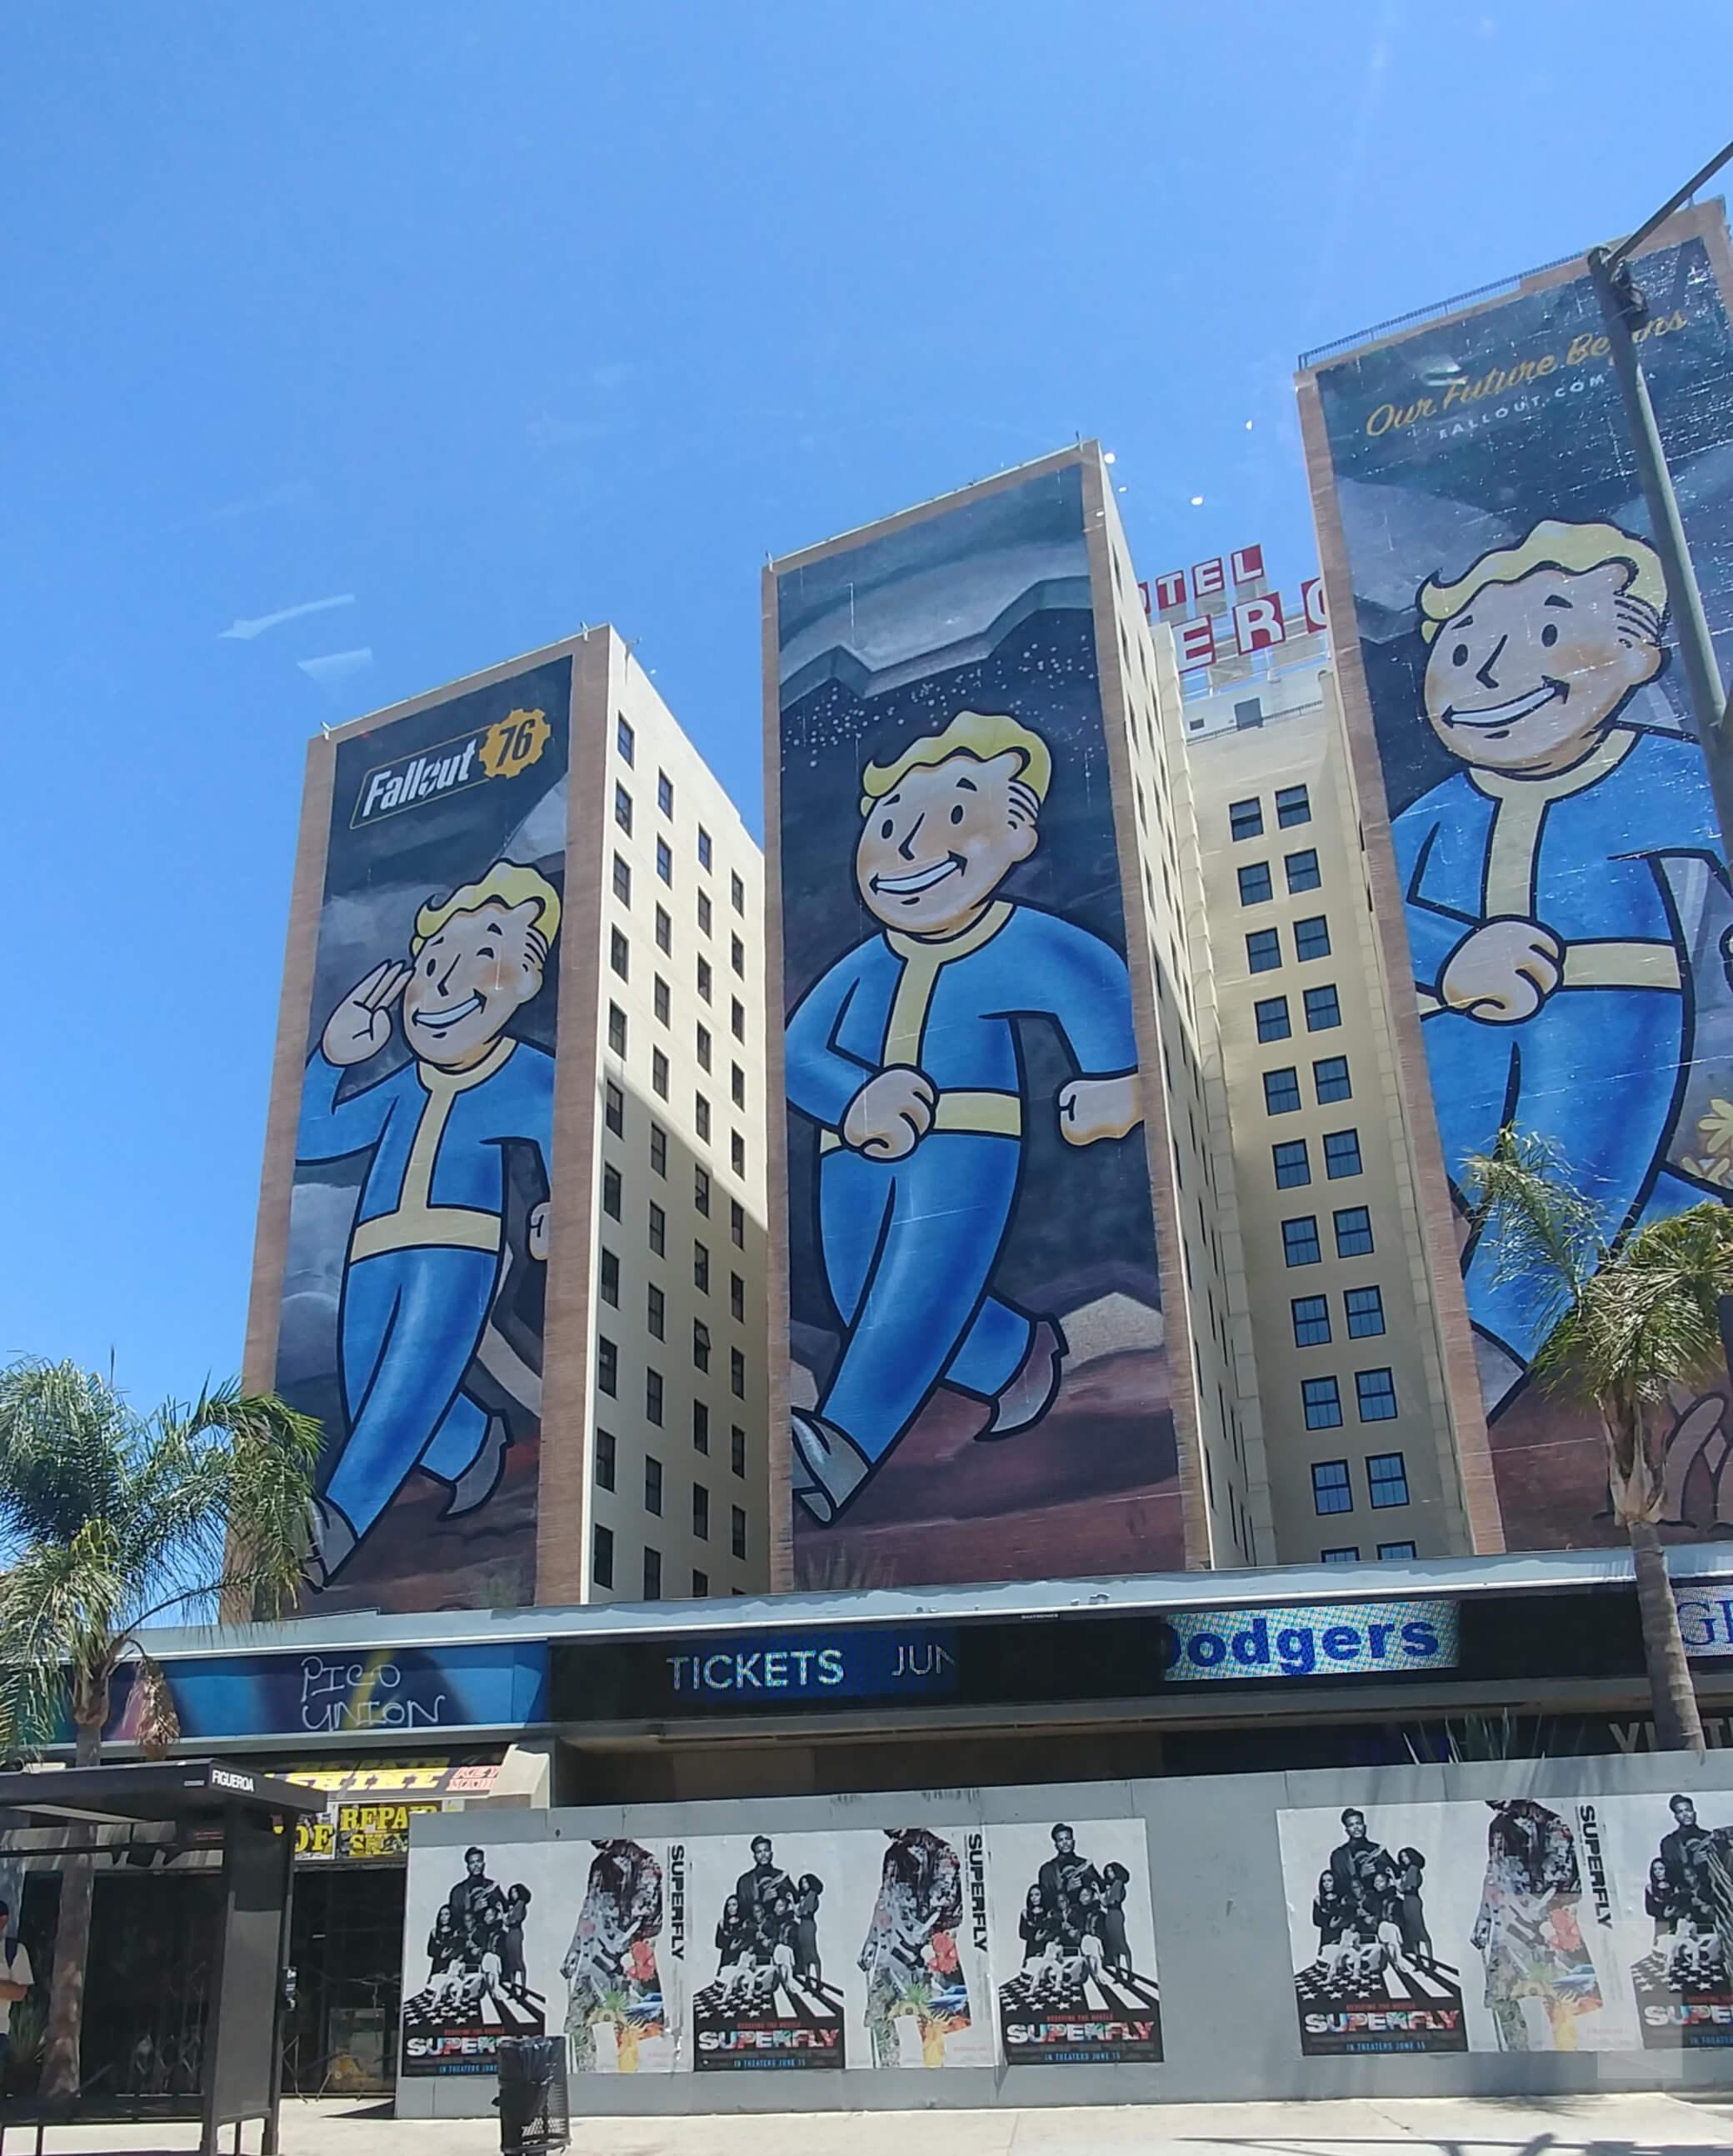 Ya tenemos el nuevo trailer de Fallout 76 [E3 2018]